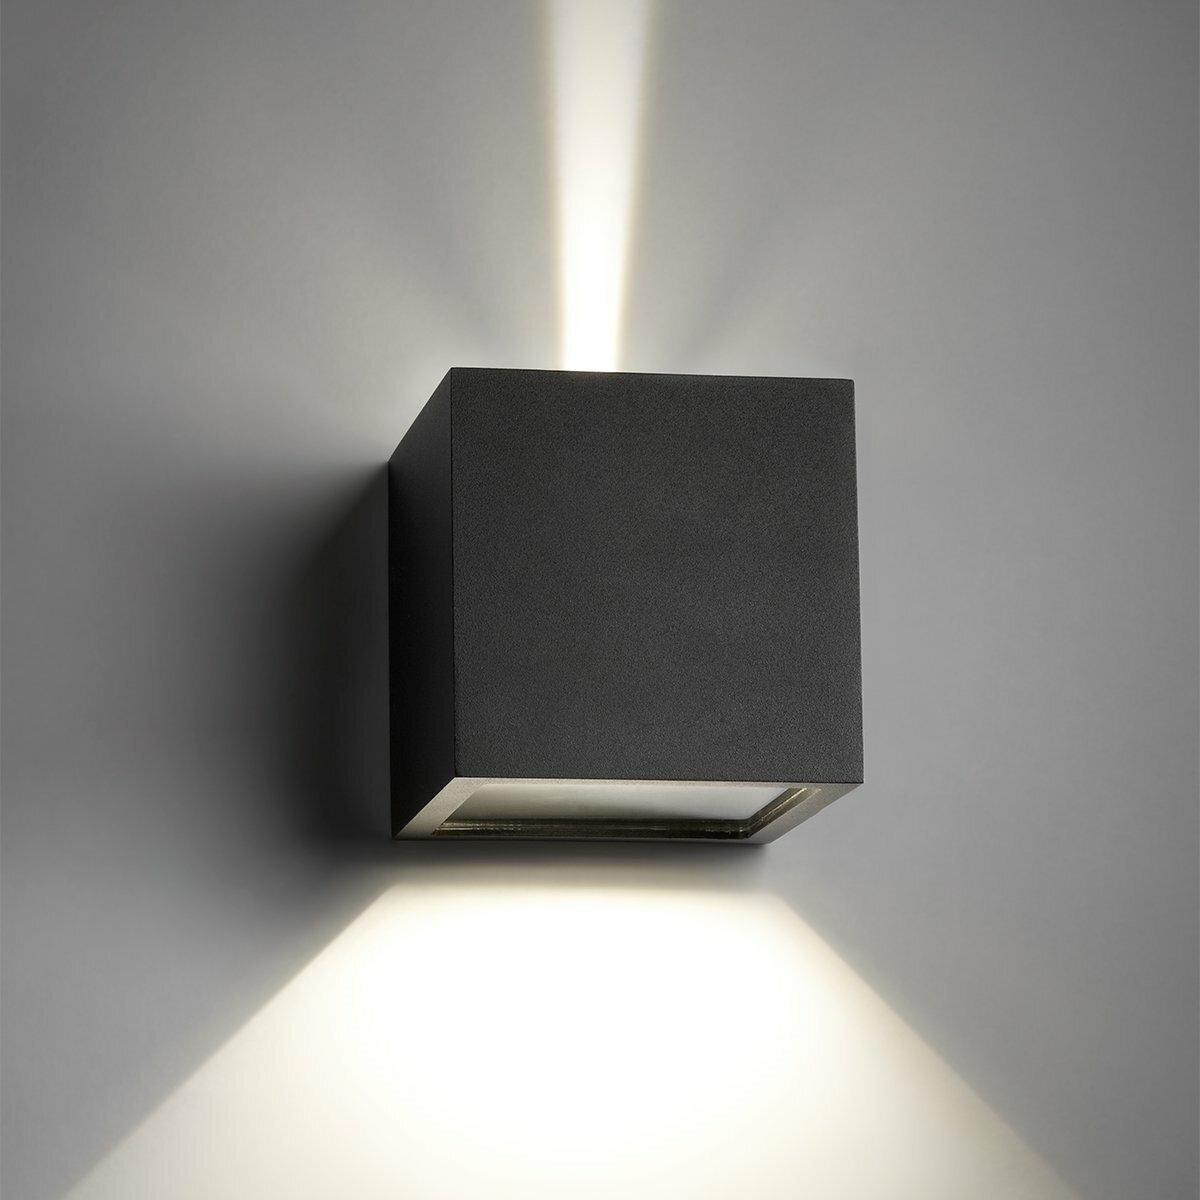 CUBE LED up-down wandlamp van Lightpoint